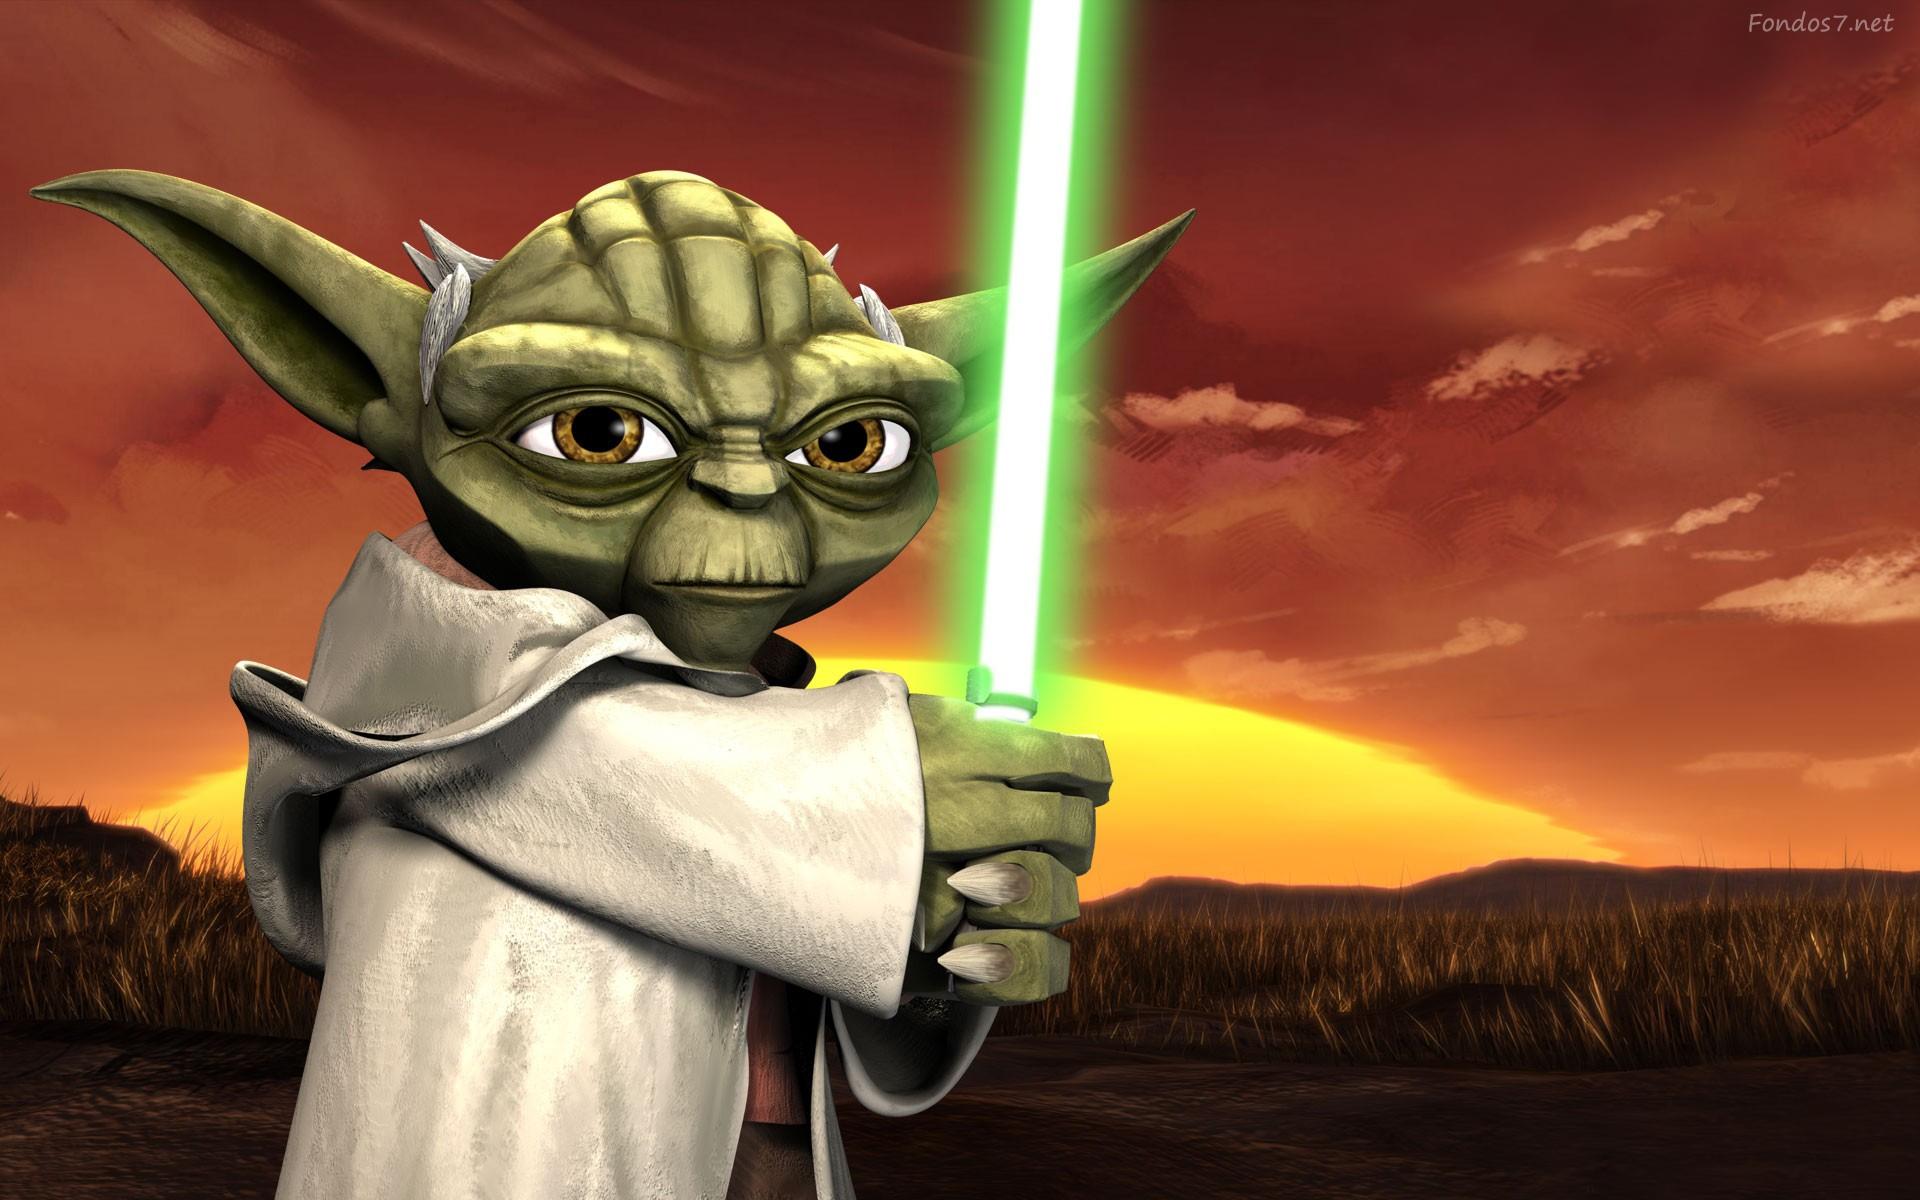 Star Wars Yoda Wallpaper Wallpapersafari